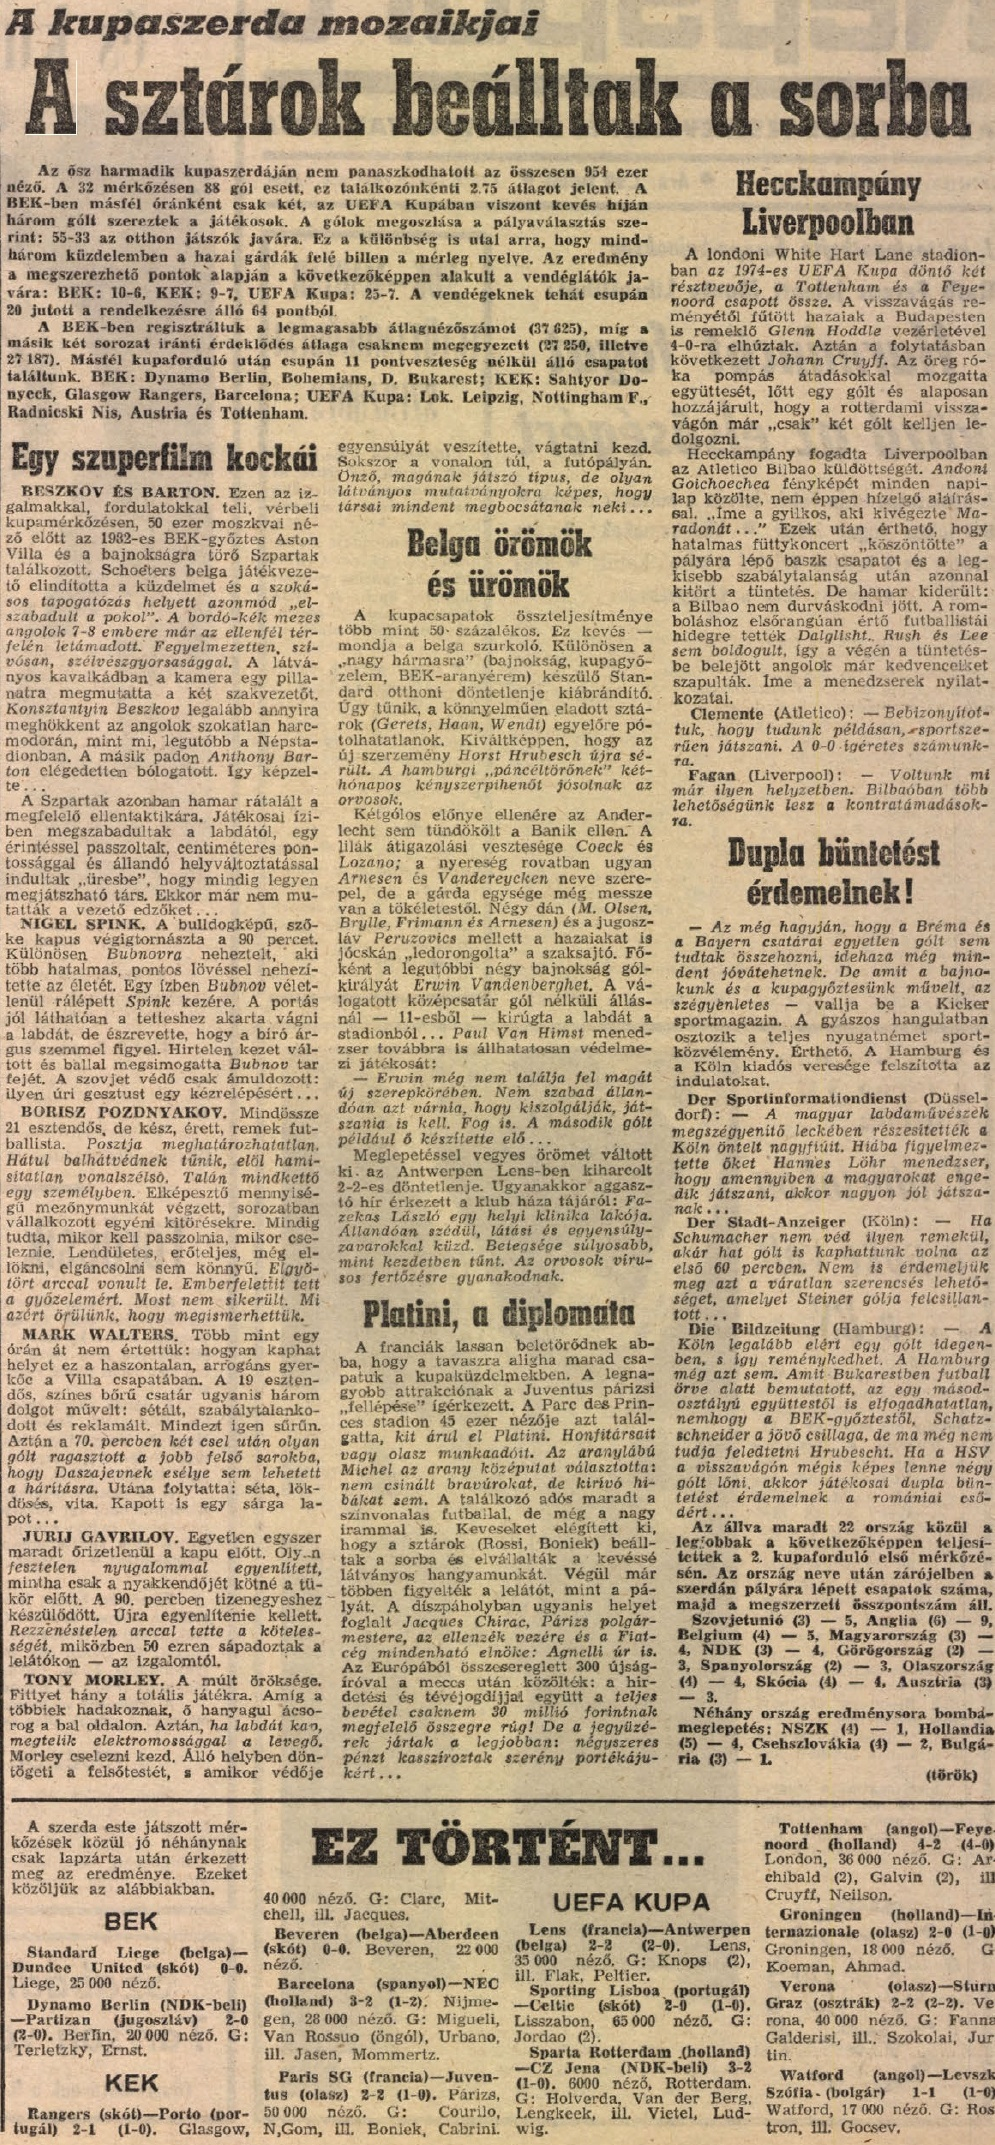 idokapszula_nb_i_1983_84_klubcsapataink_nemzetkozi_kupaszereplese_2_fordulo_1_kor_kupaszerda_2.jpg